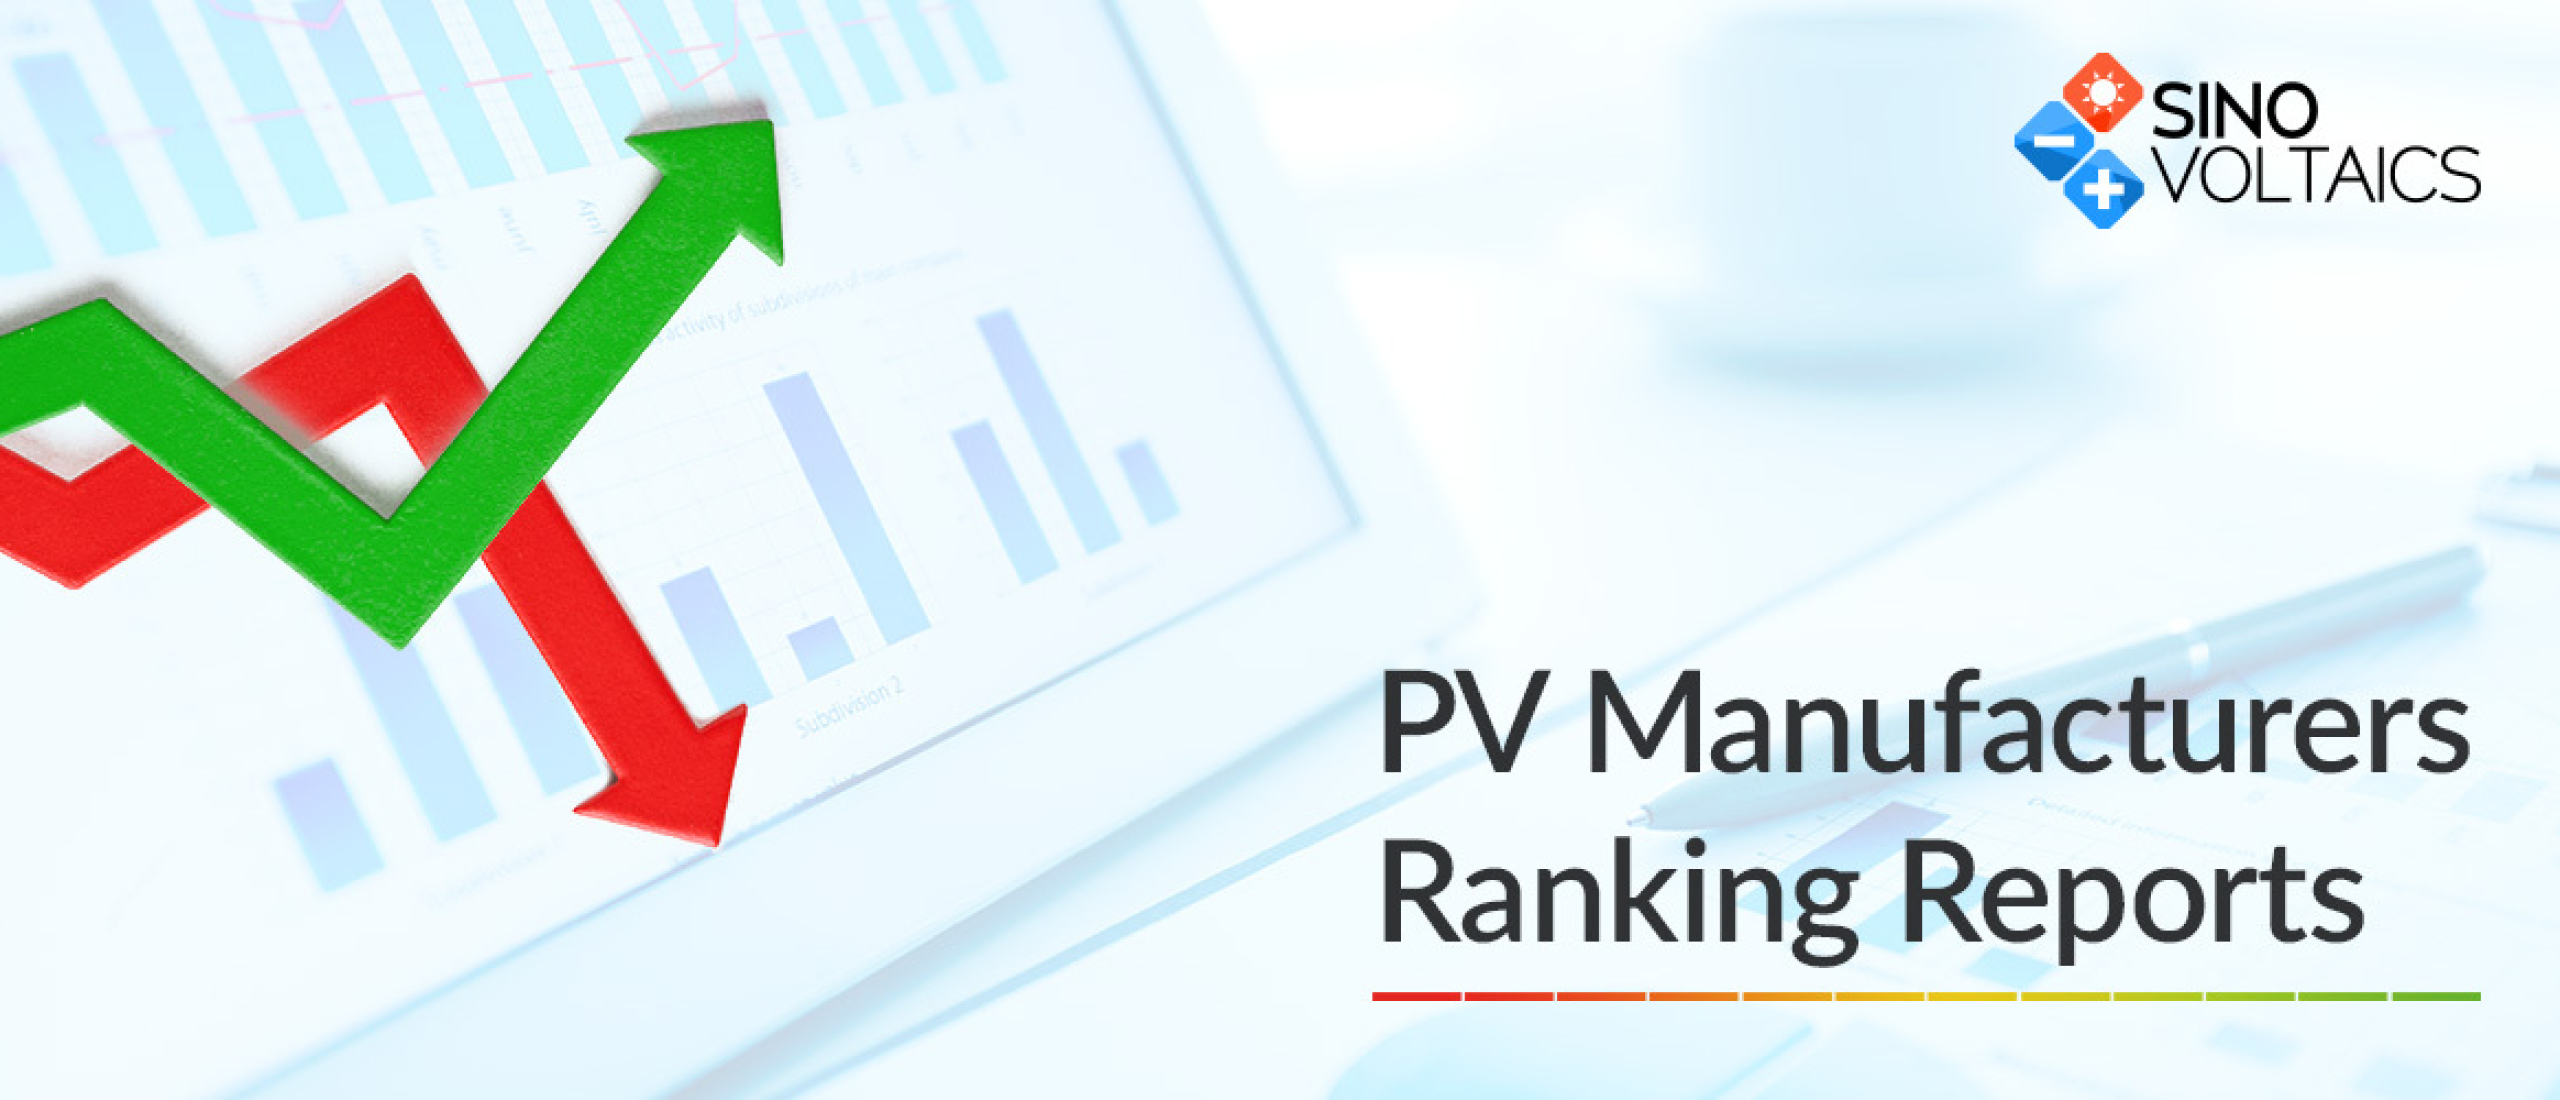 Sinovoltaics Ranking Reports: Edition 3-2021